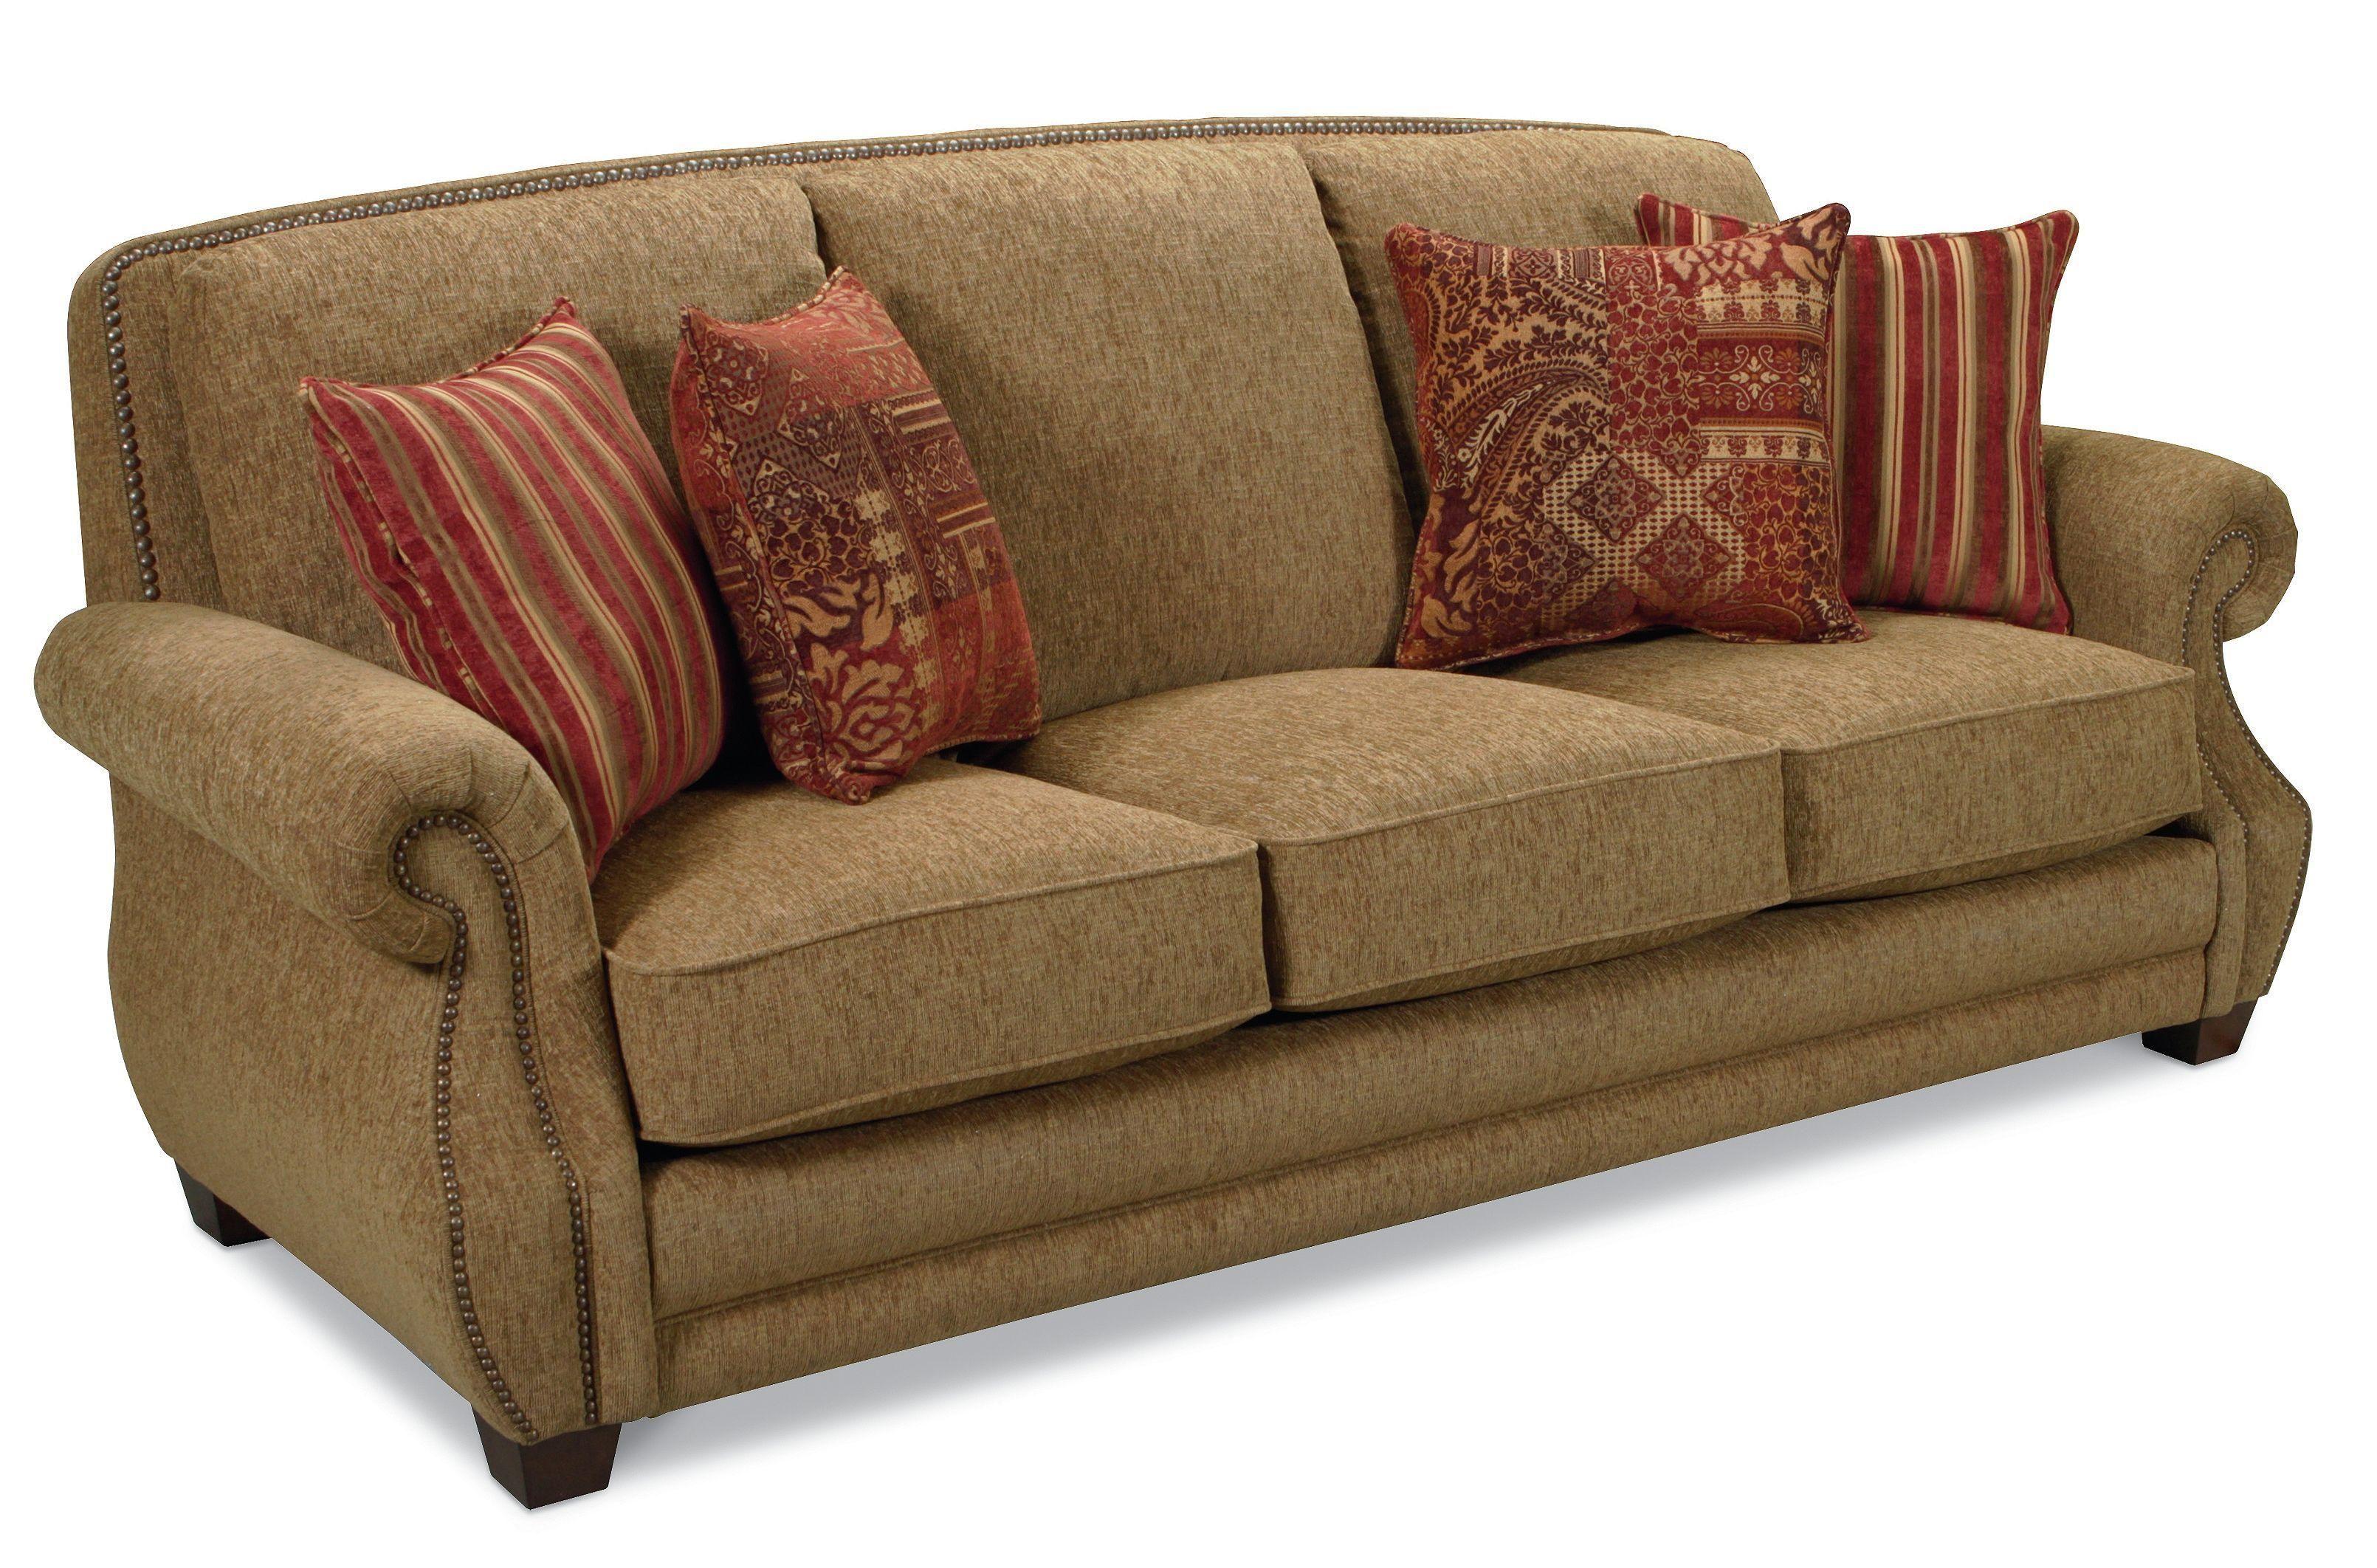 Westbury Stationary Sofa By Lane With Images Sofa Wayfair